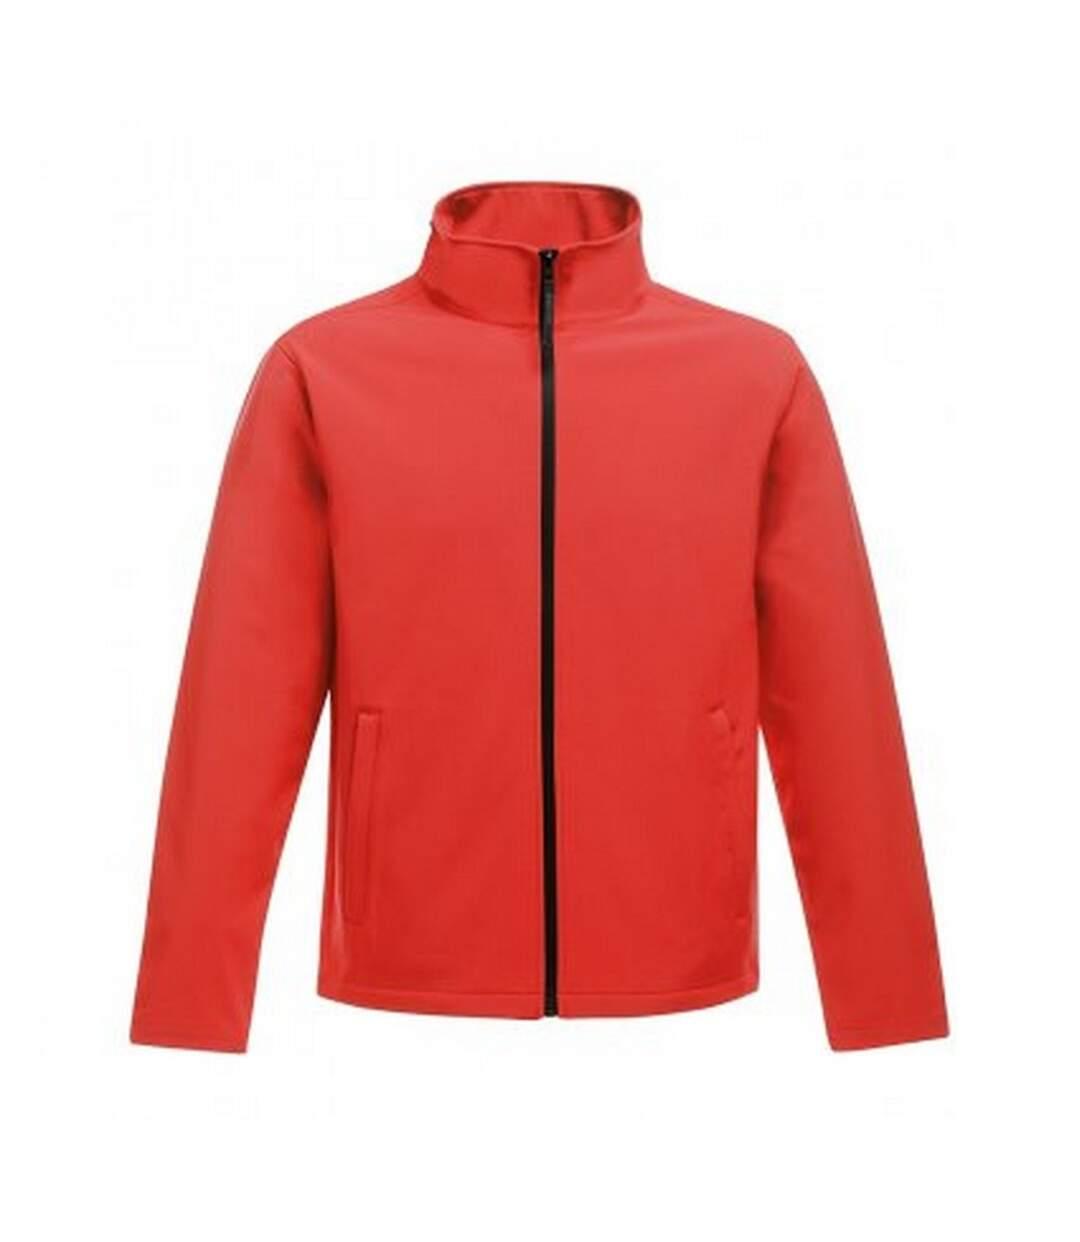 Regatta Standout Mens Ablaze Printable Soft Shell Jacket (Classic Red/Black) - UTPC3322